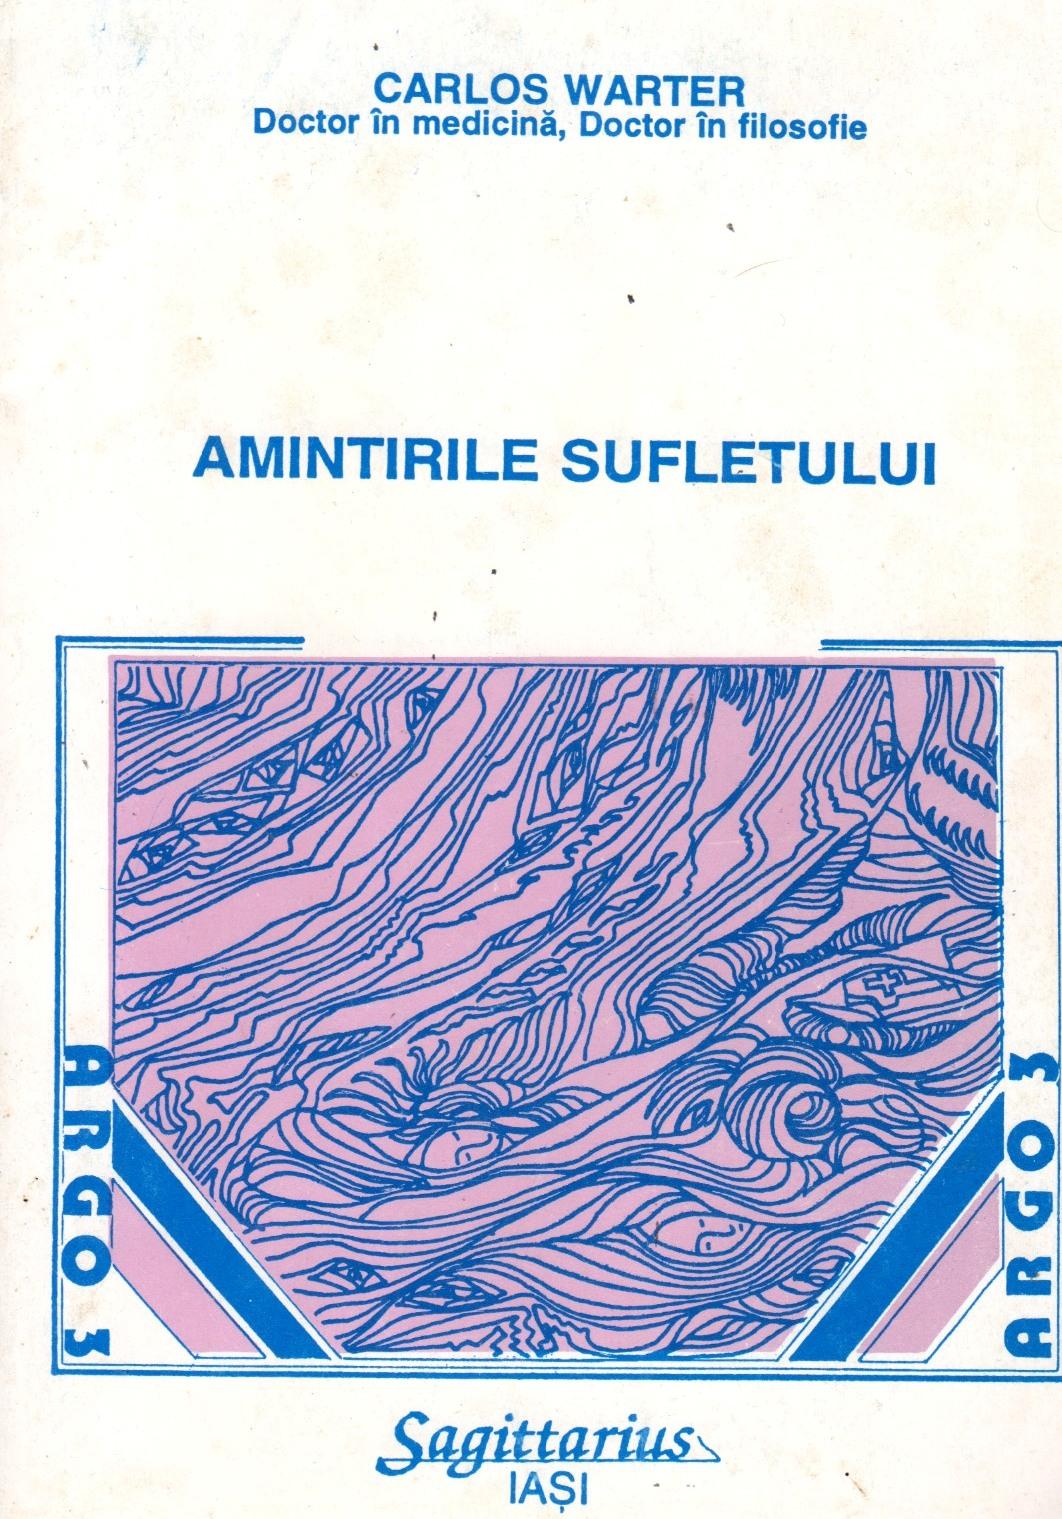 Amitirile006.jpg